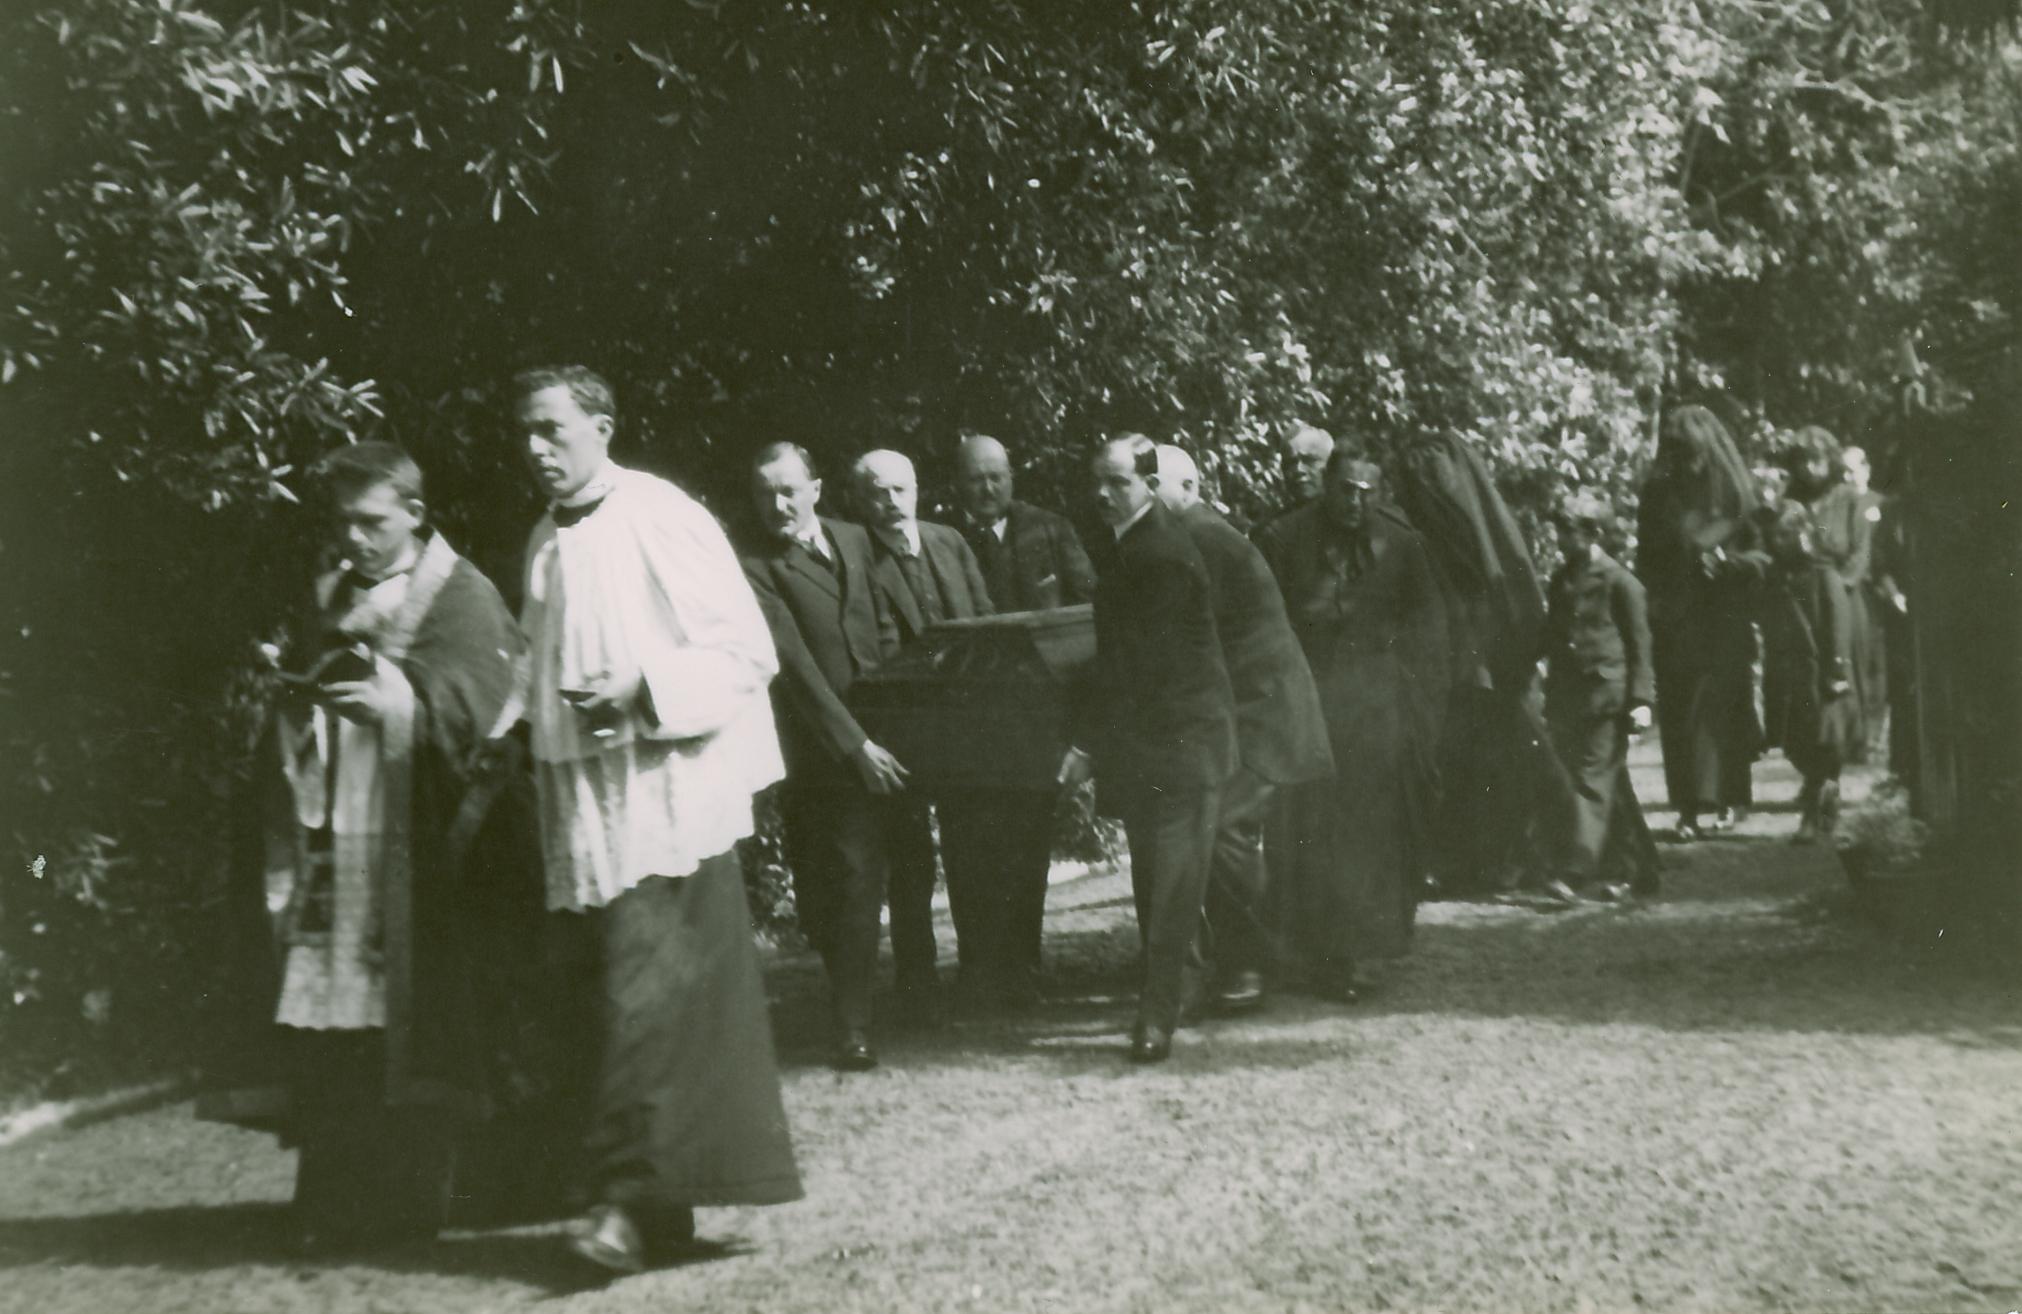 Emperor Karl's Casket is Carried Around the Villa Before the Requiem Mass